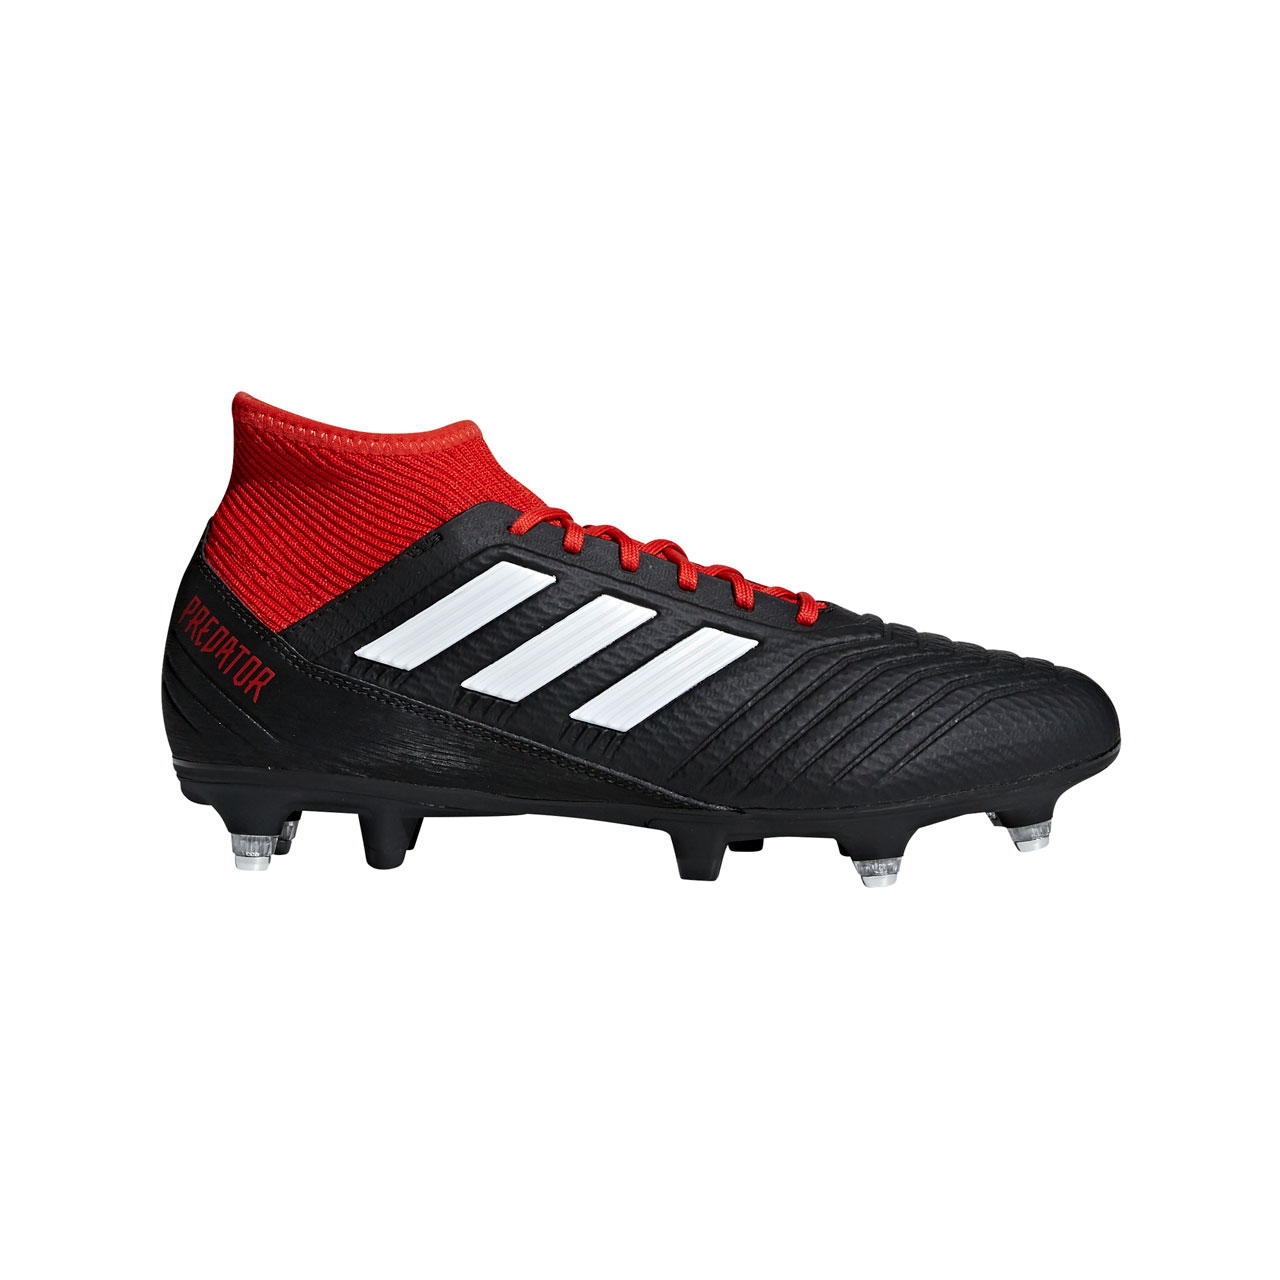 online store 1cf6e d9044 Auslaufmodelle   adidas   Marken   Sport HAAS - Online